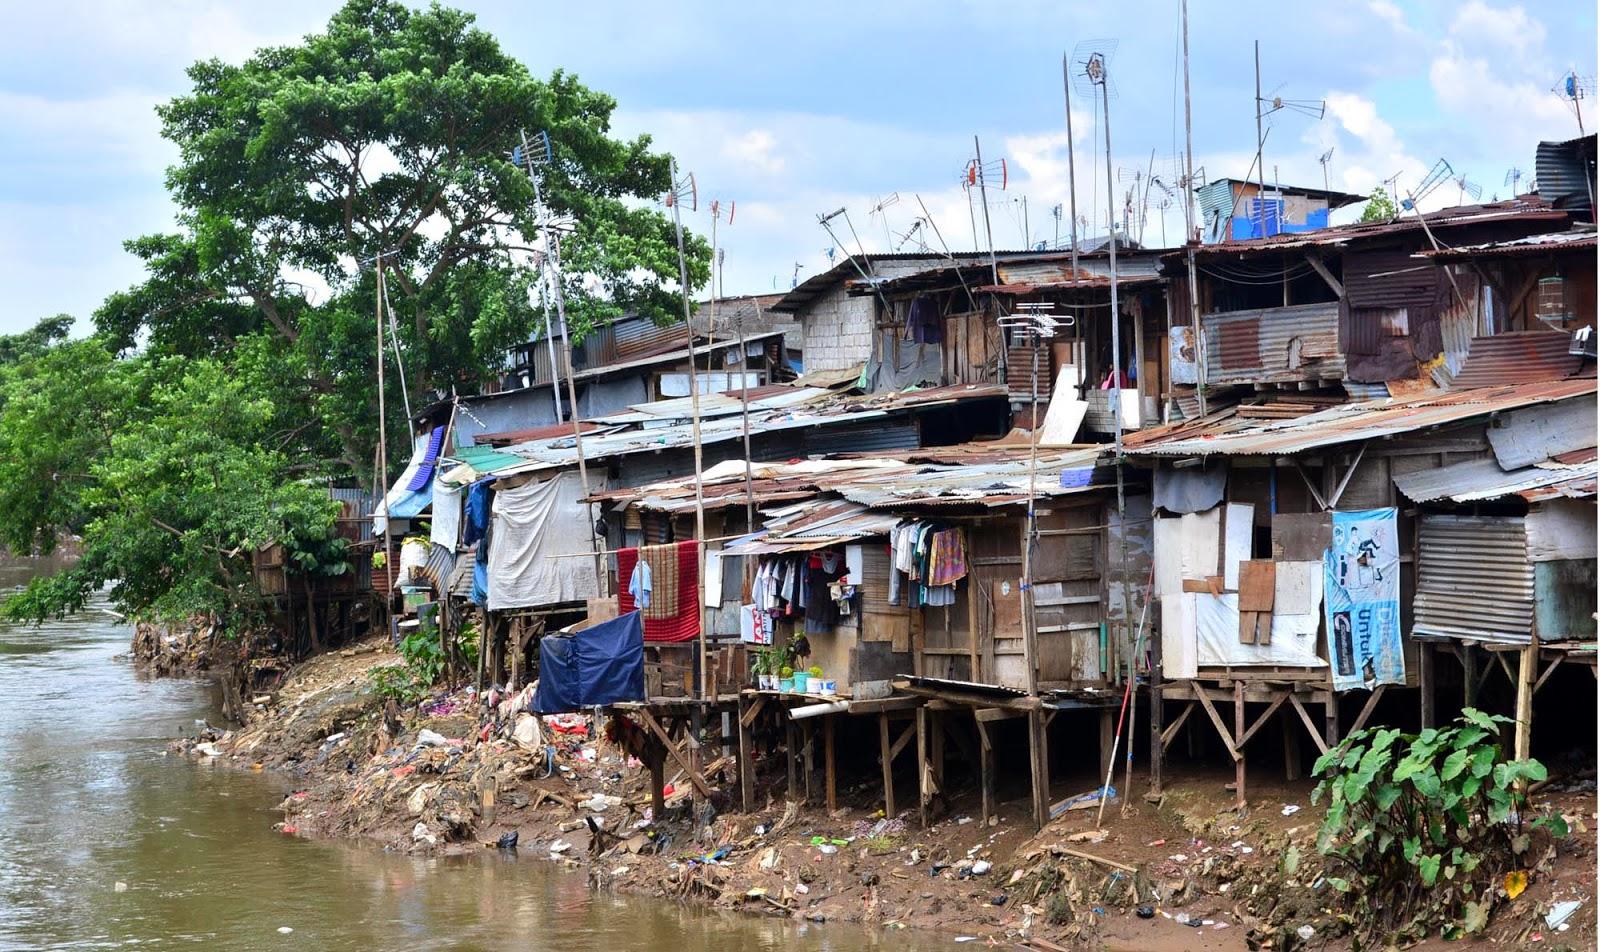 potensi bahaya bangunan rumah di pinggir sungai kovoid